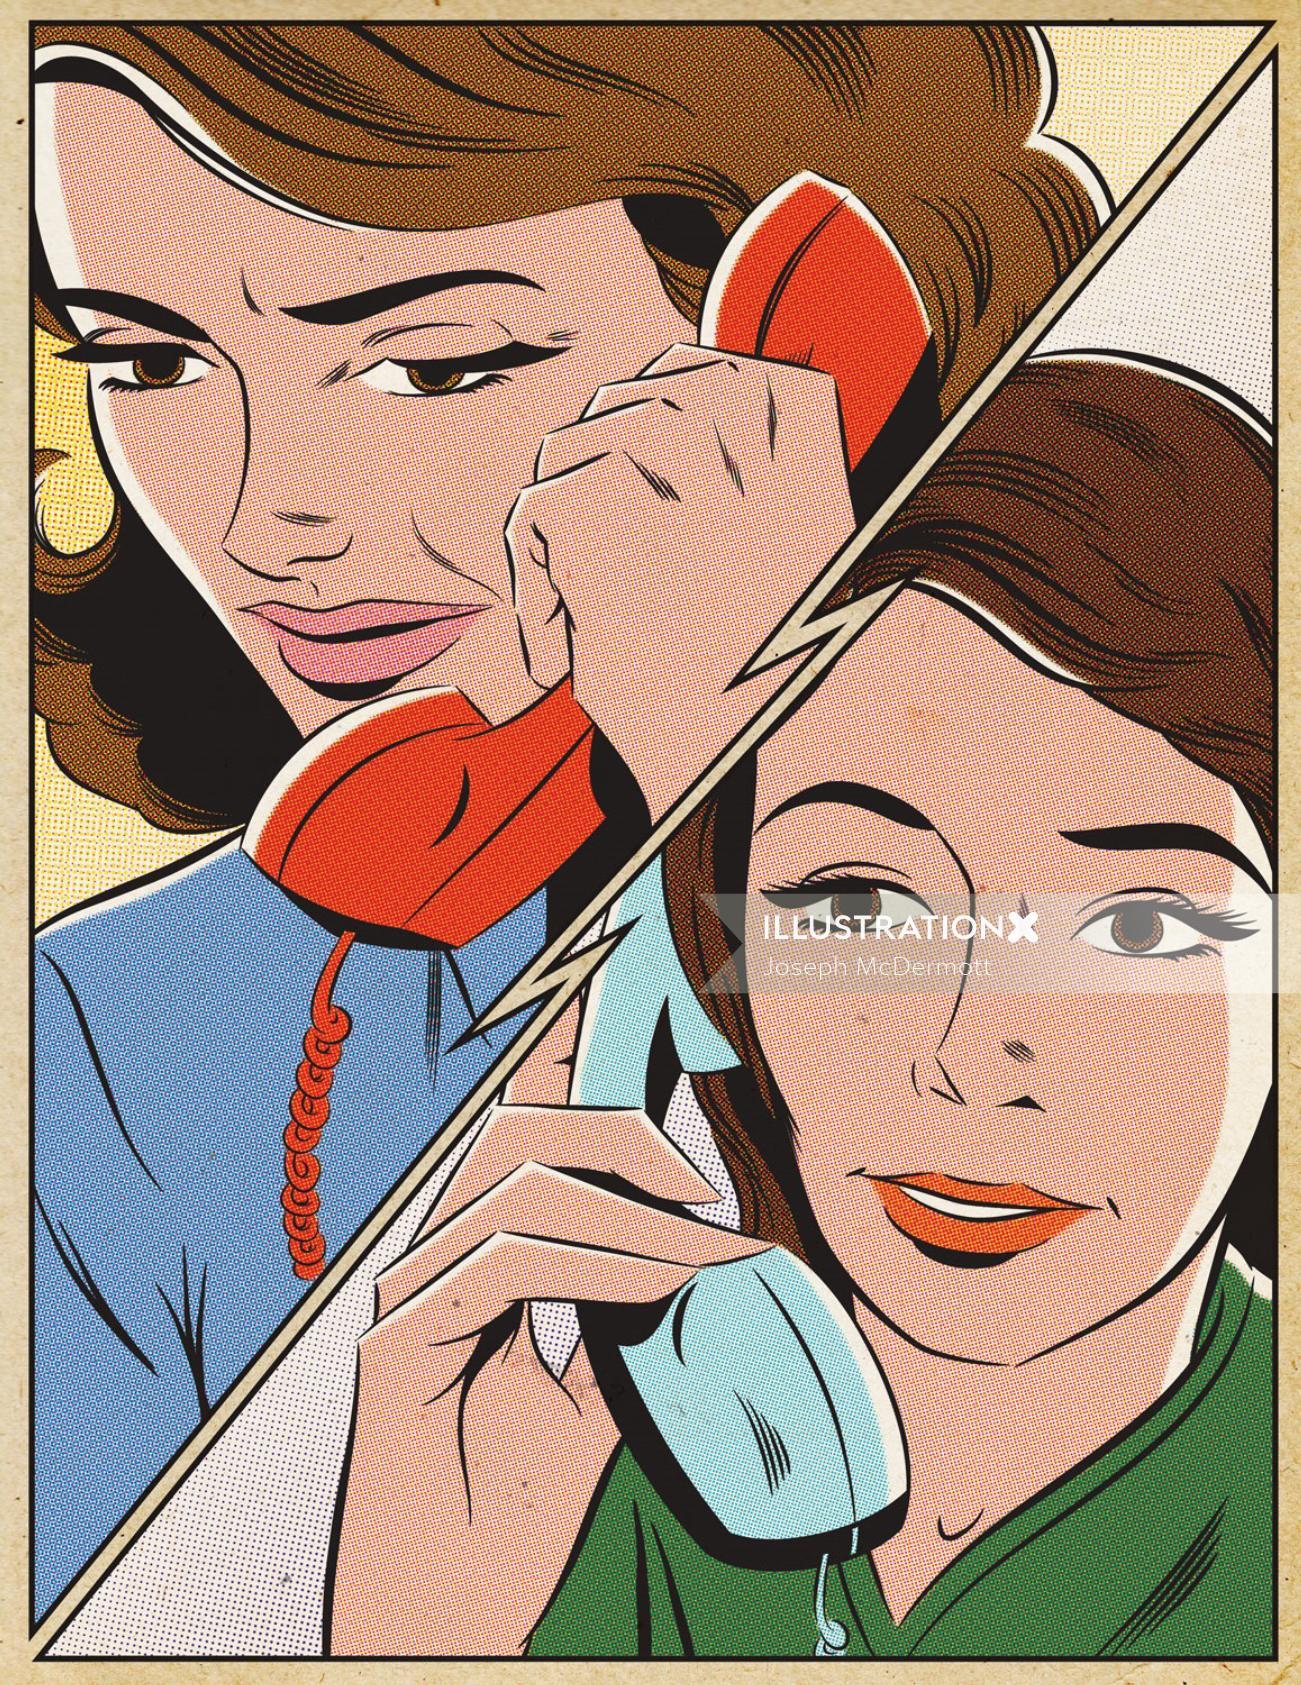 Illustration of girls talking over phone